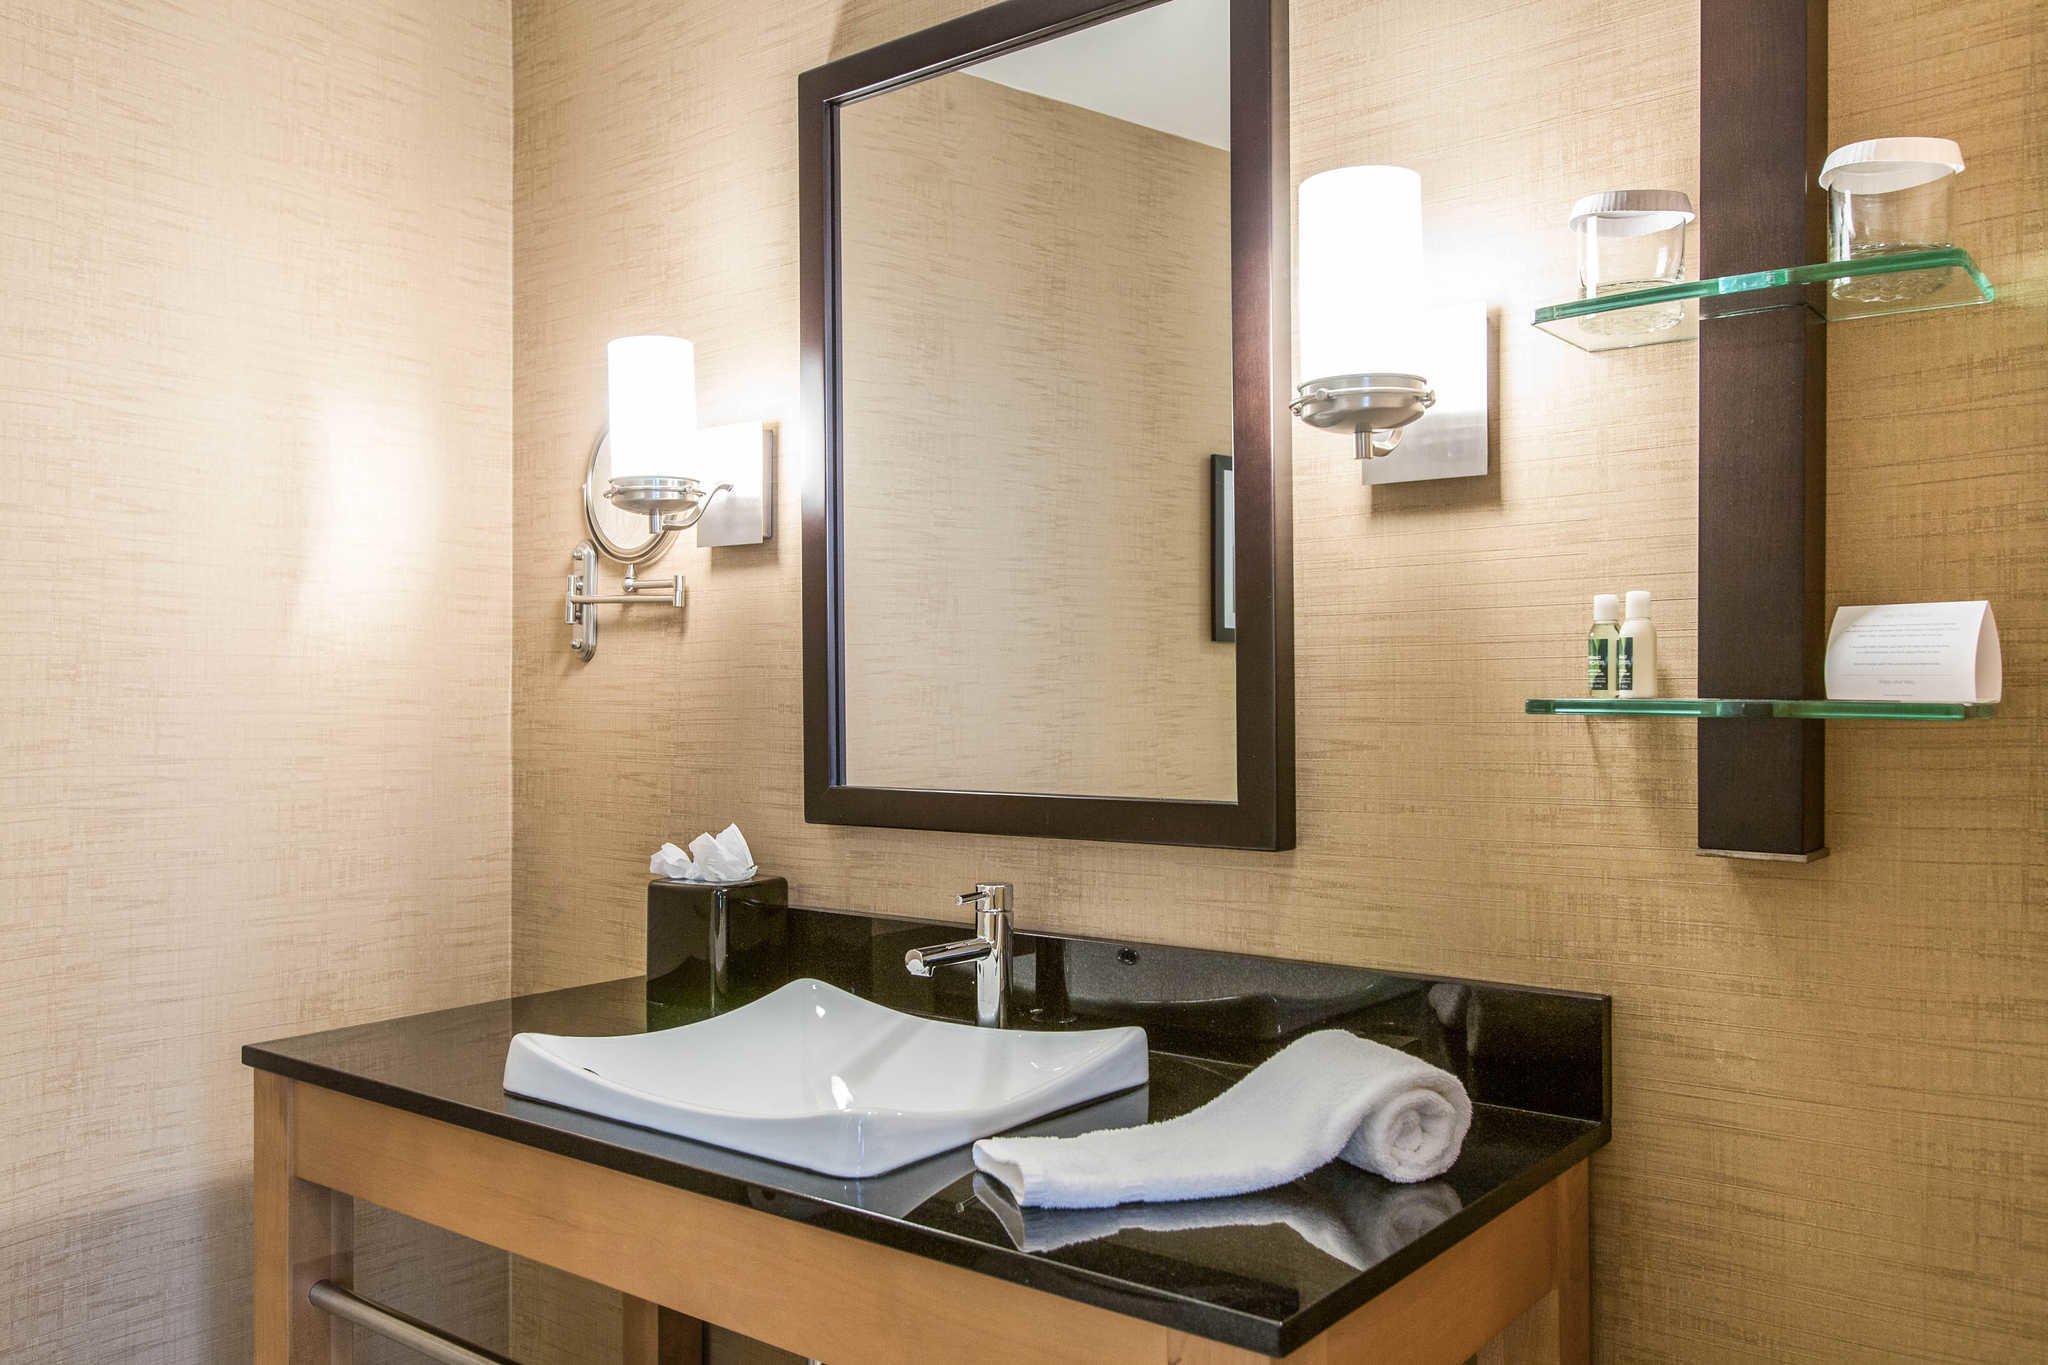 Las Vegas Hotels Atlantic City Casinos amp More Caesars